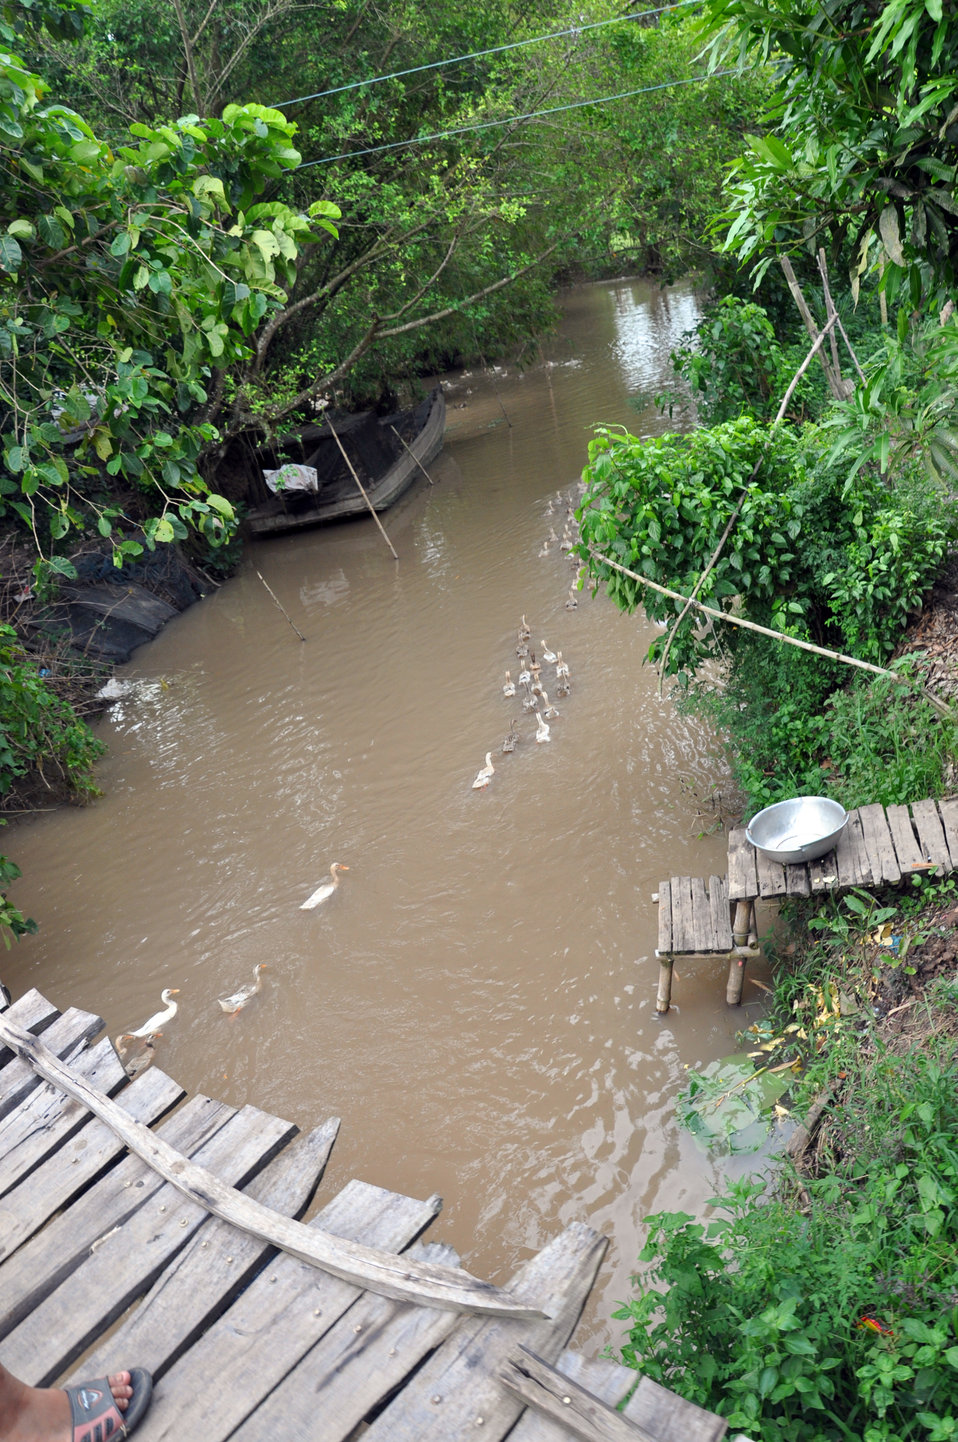 Ducks paddle downstream in Vietnam's Mekong Delta